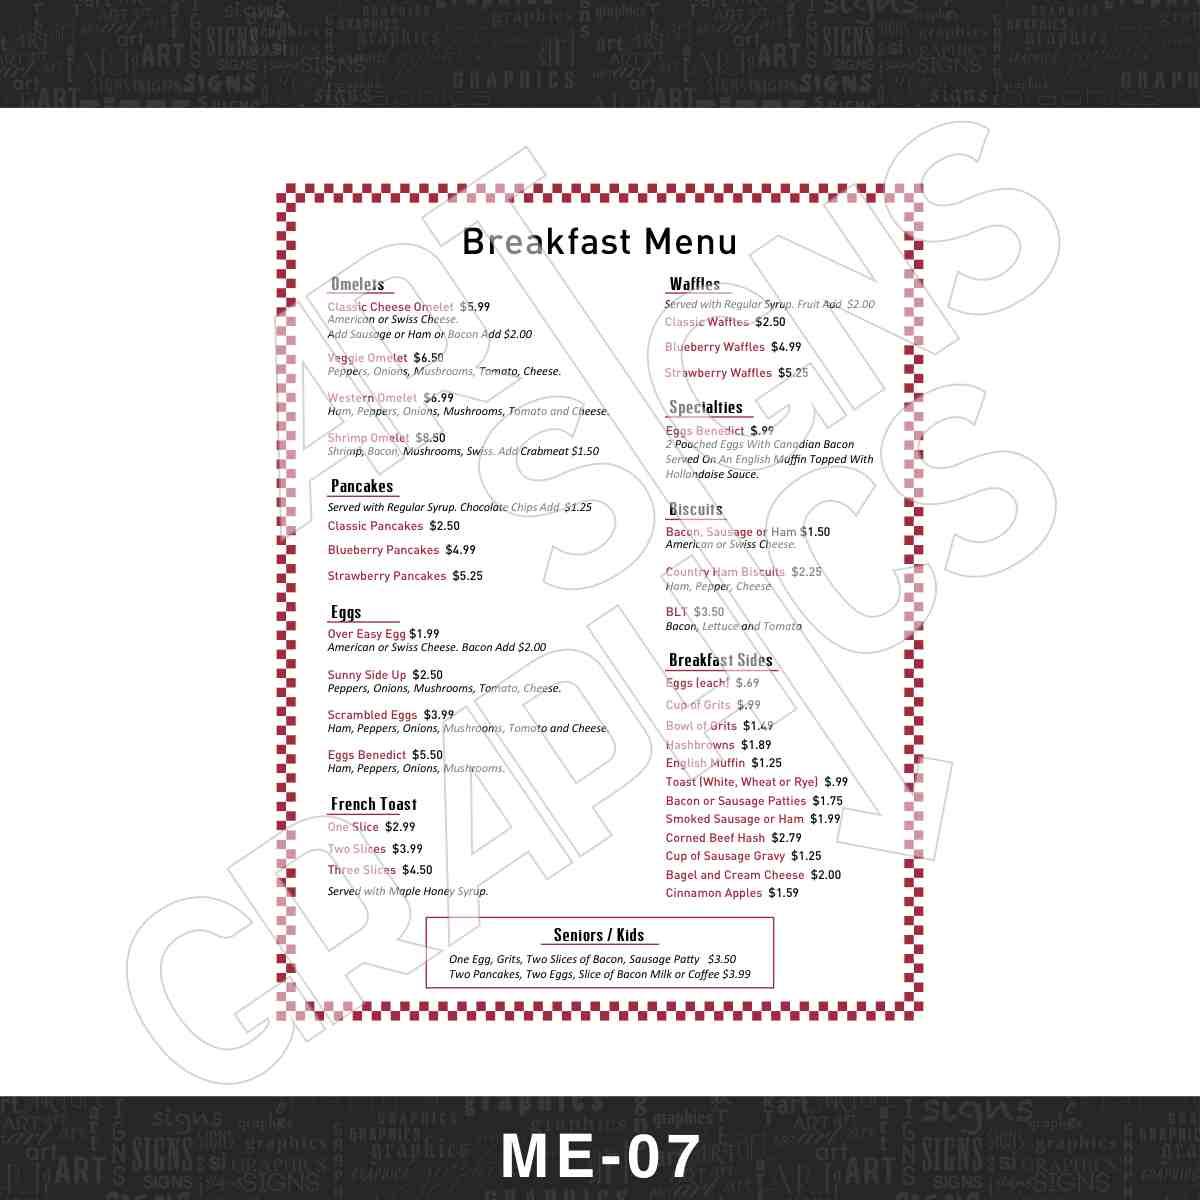 ME-07.jpg